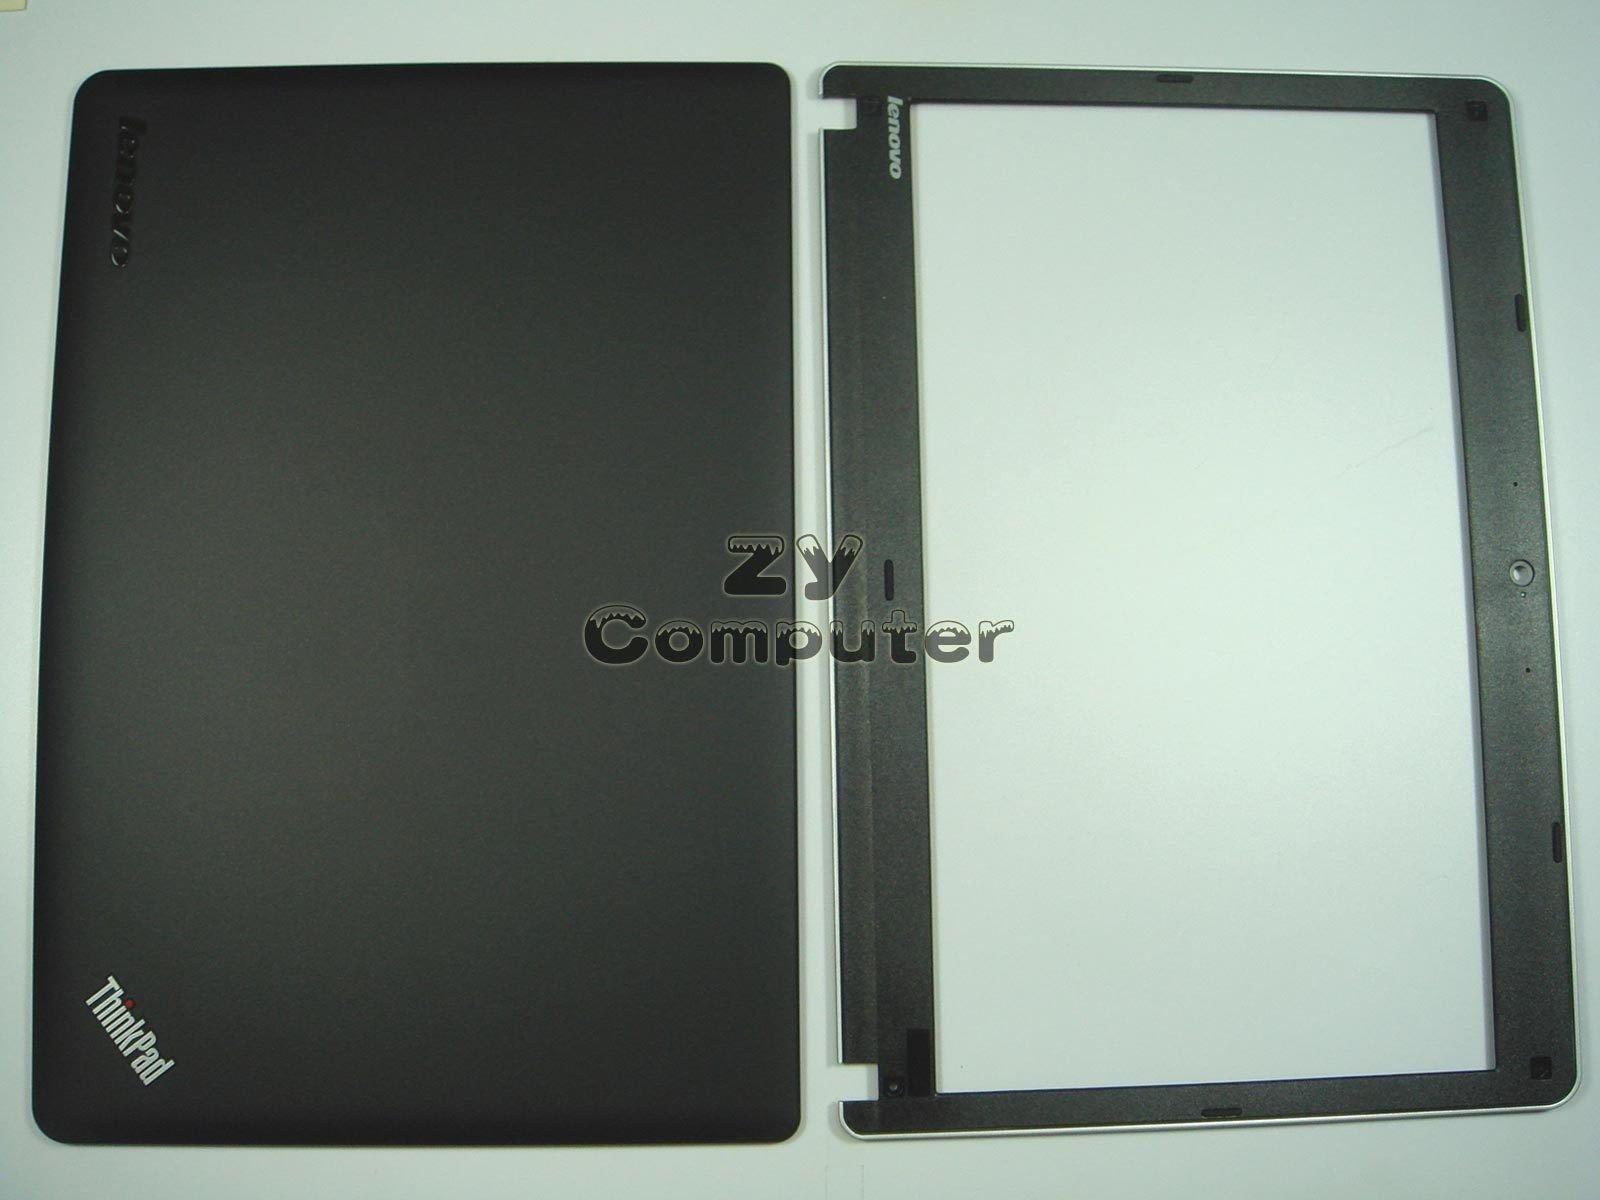 Lenovo ThinkPad Edge E430 Edge E435 Edge E430c LCD Back Cover With front Bezel LOGO 04W4234 AP0NU000920 - BLUE by IBM